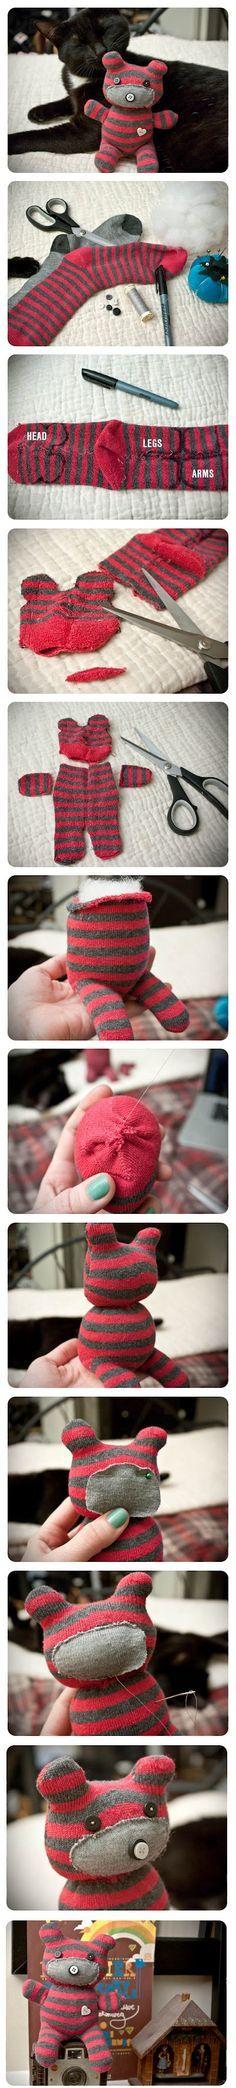 DIY Cute Little Teddy Bear and not creepy like sock monkeys.